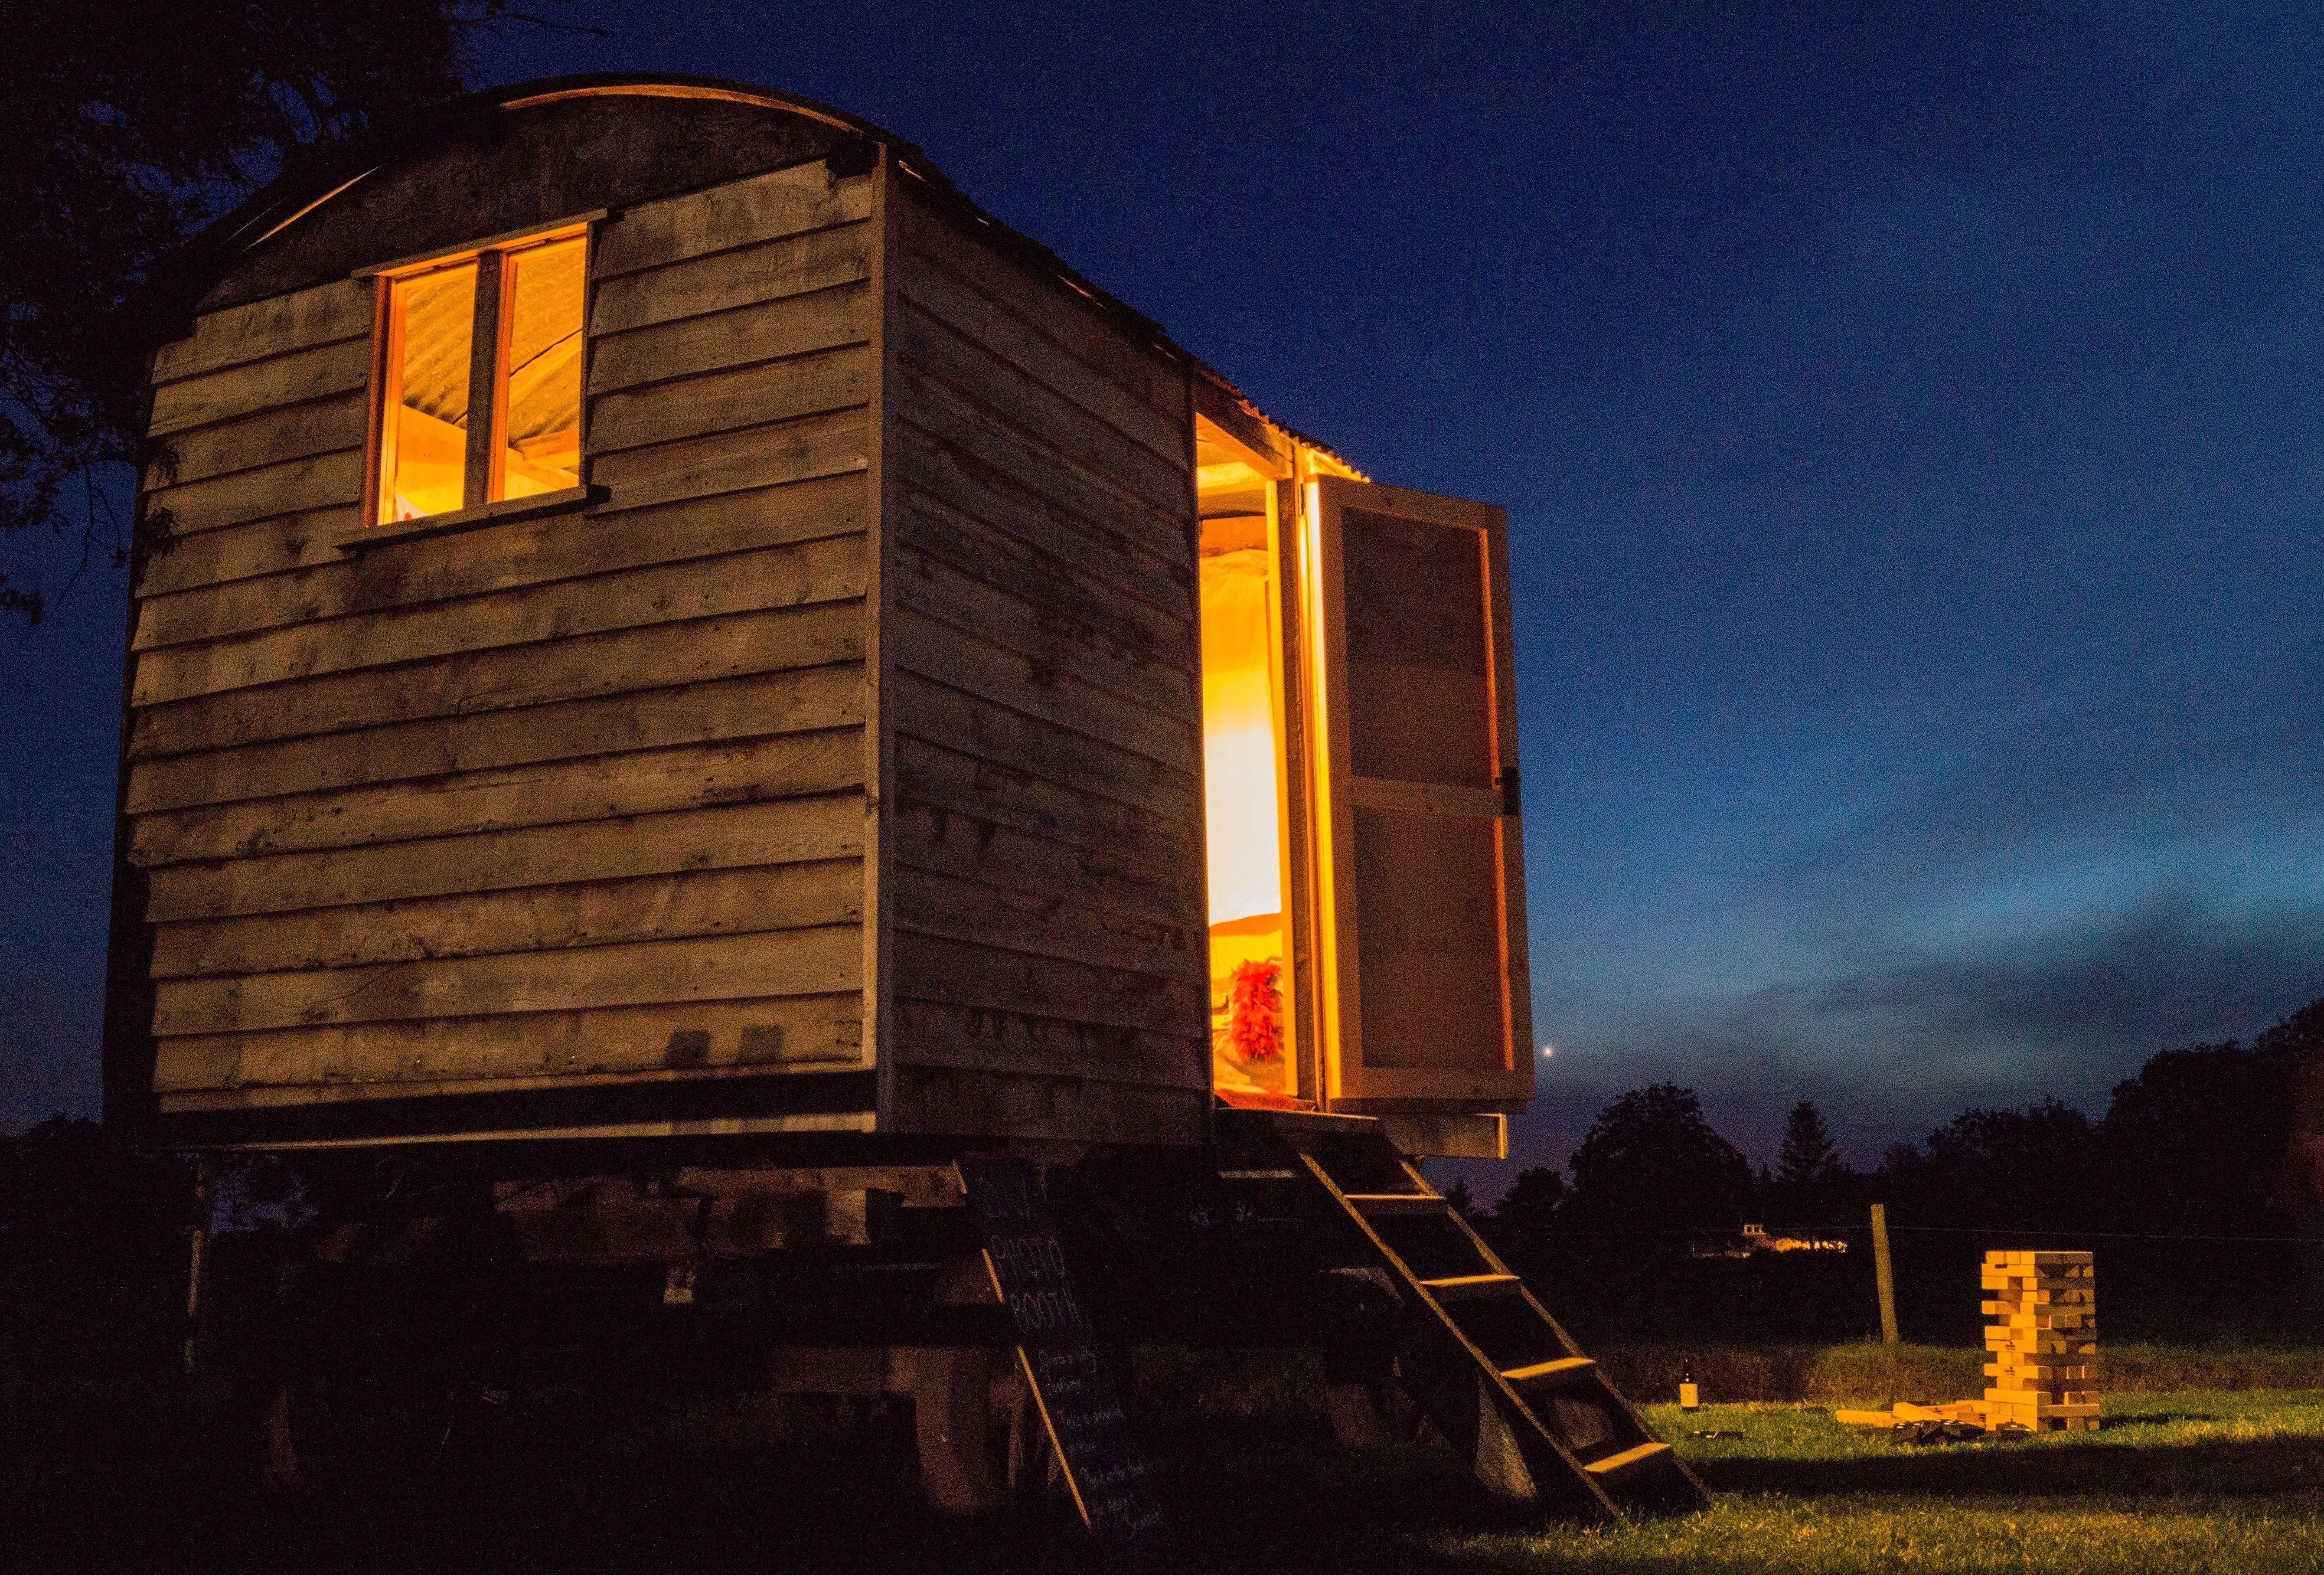 Huis Donker Hout : Gratis afbeeldingen : boom licht hemel hout nacht wiel spel